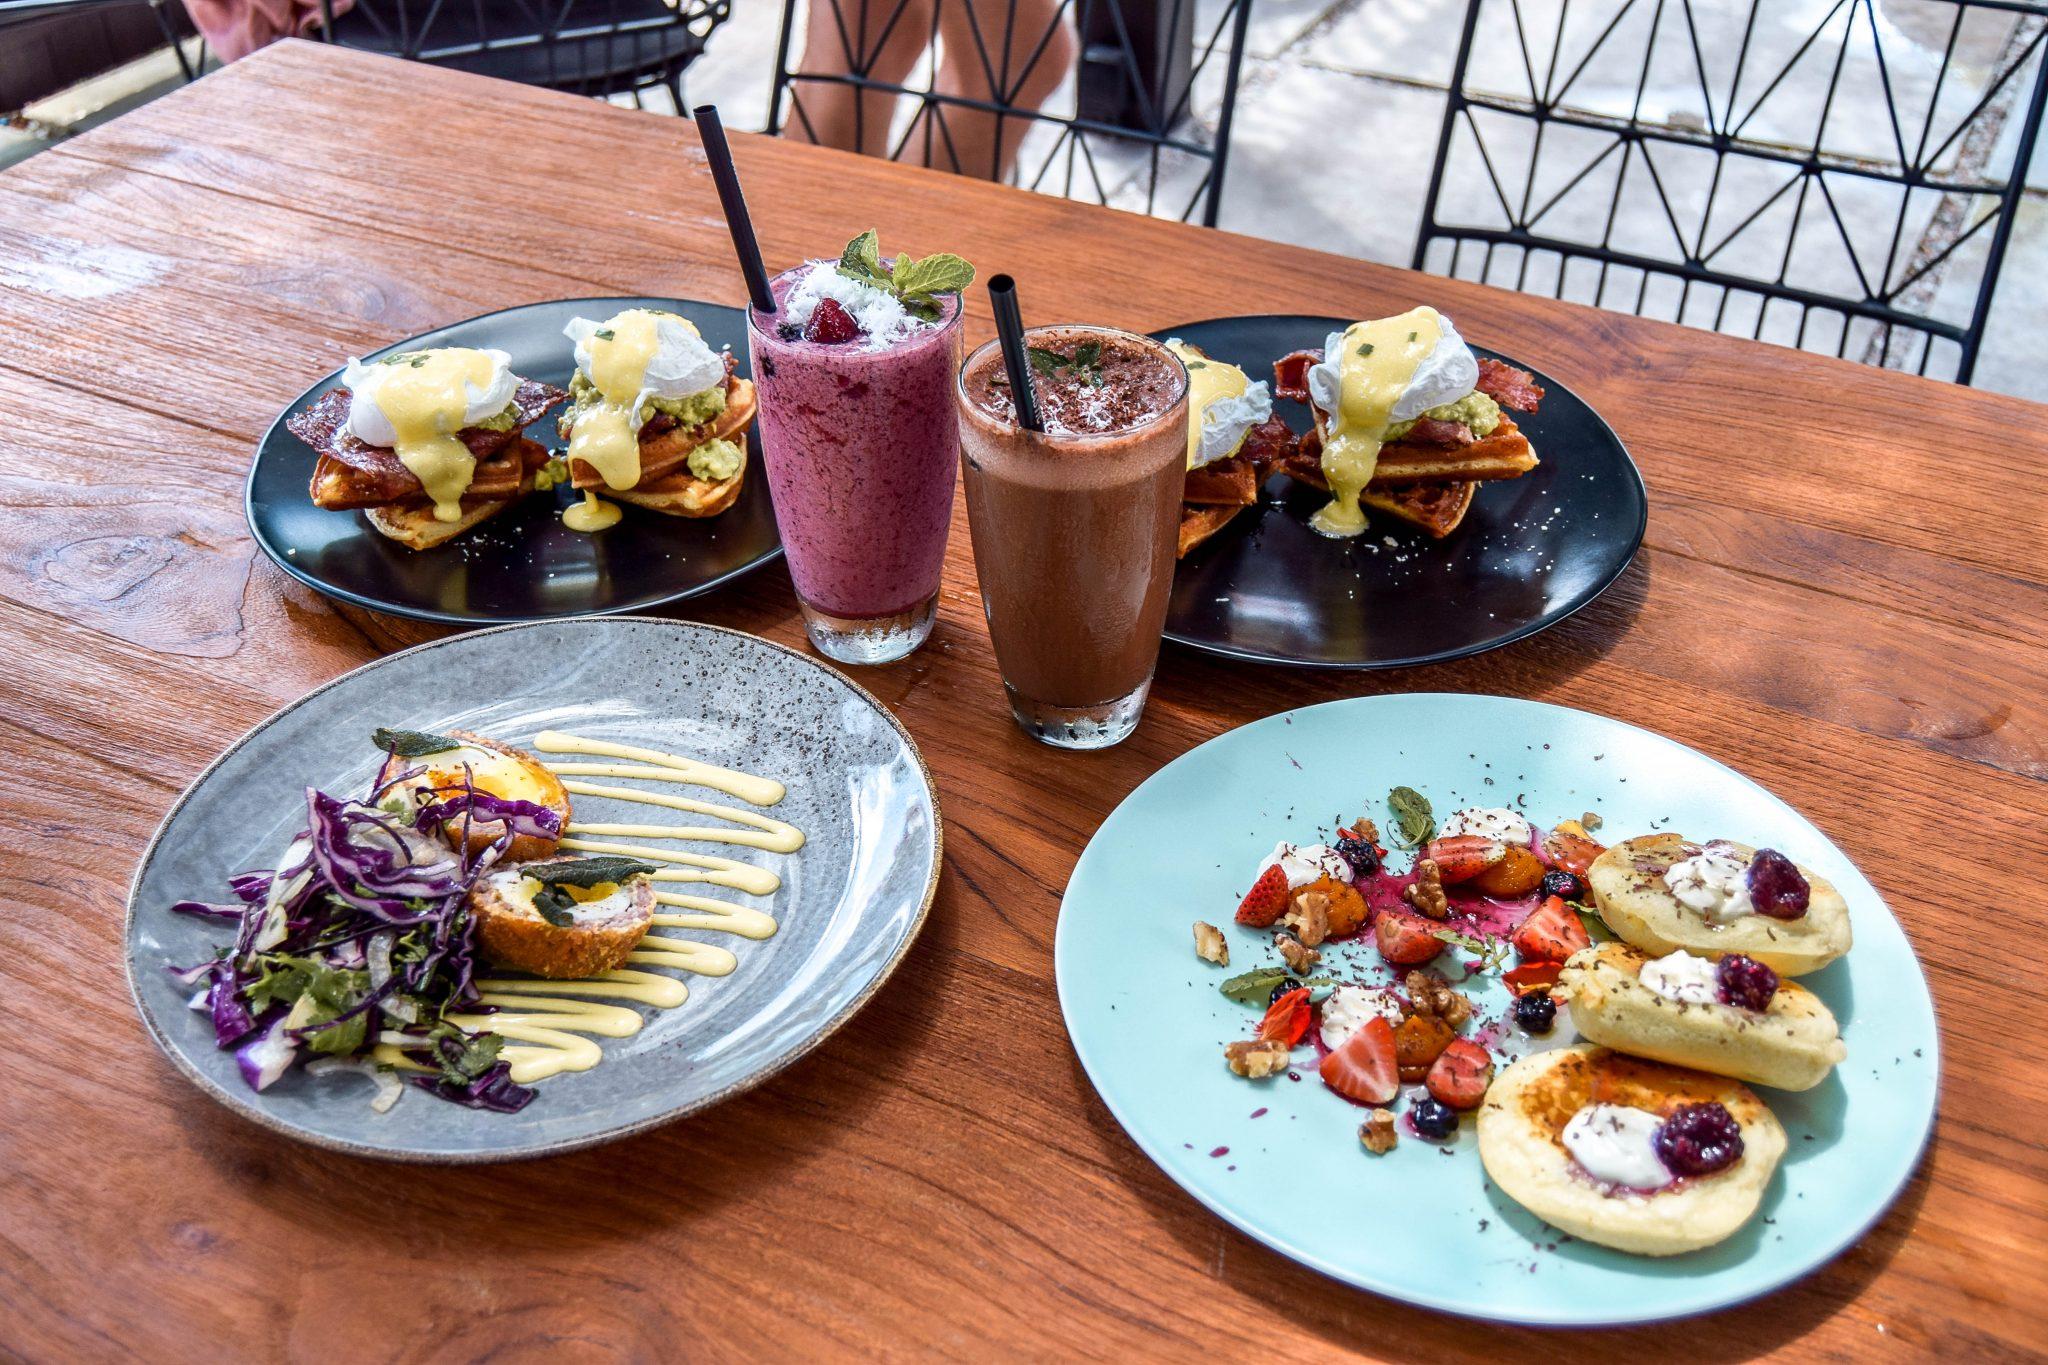 Wanderers & Warriors - Kembali Berawa - Best Restaurants In Bali Restaurants - Best Restaurants In Berawa